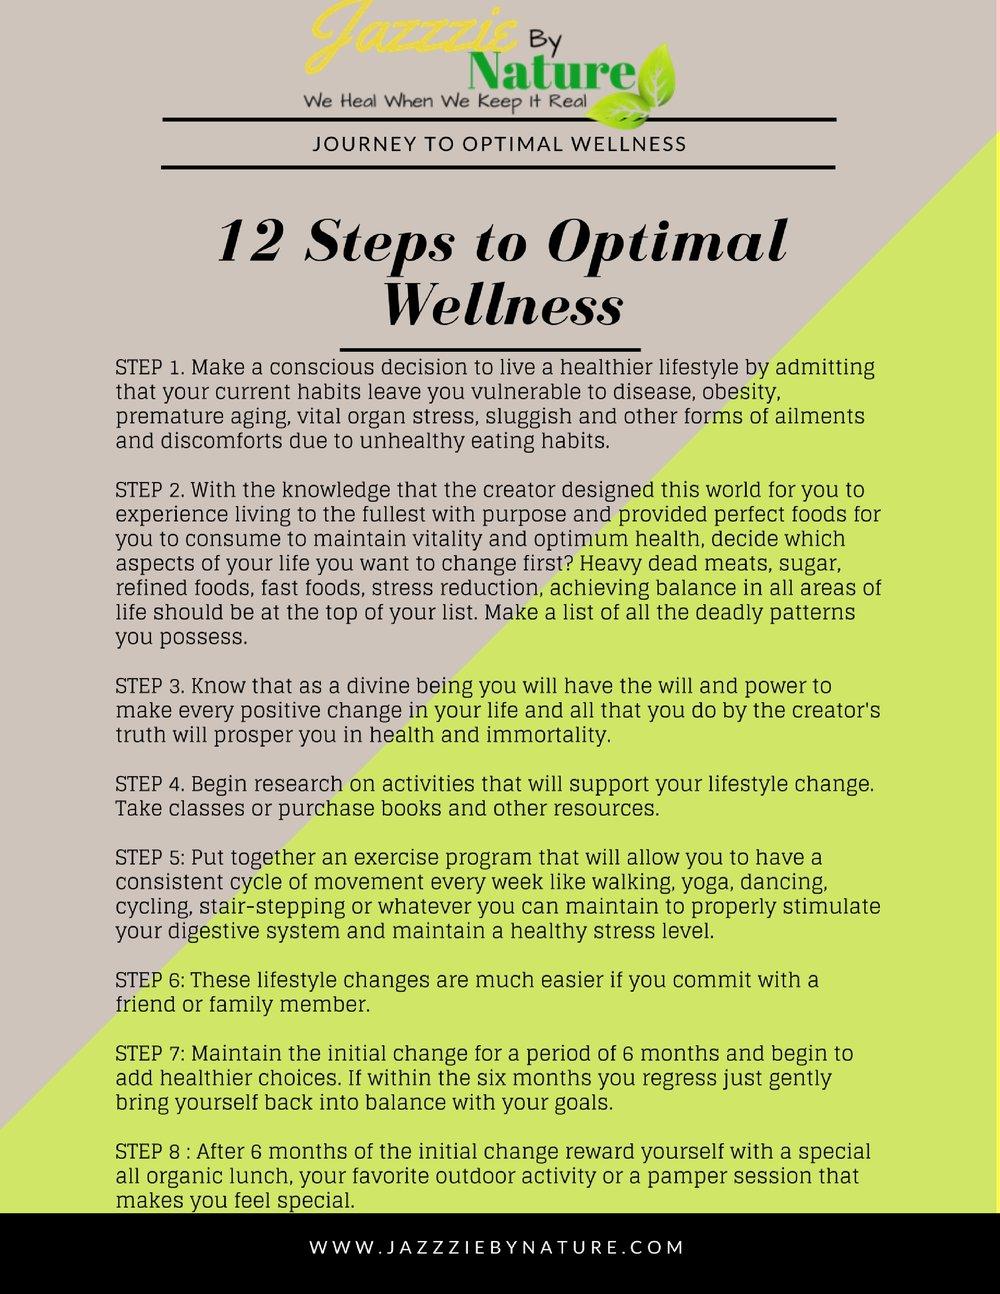 Journey to Optimal Wellness.jpg